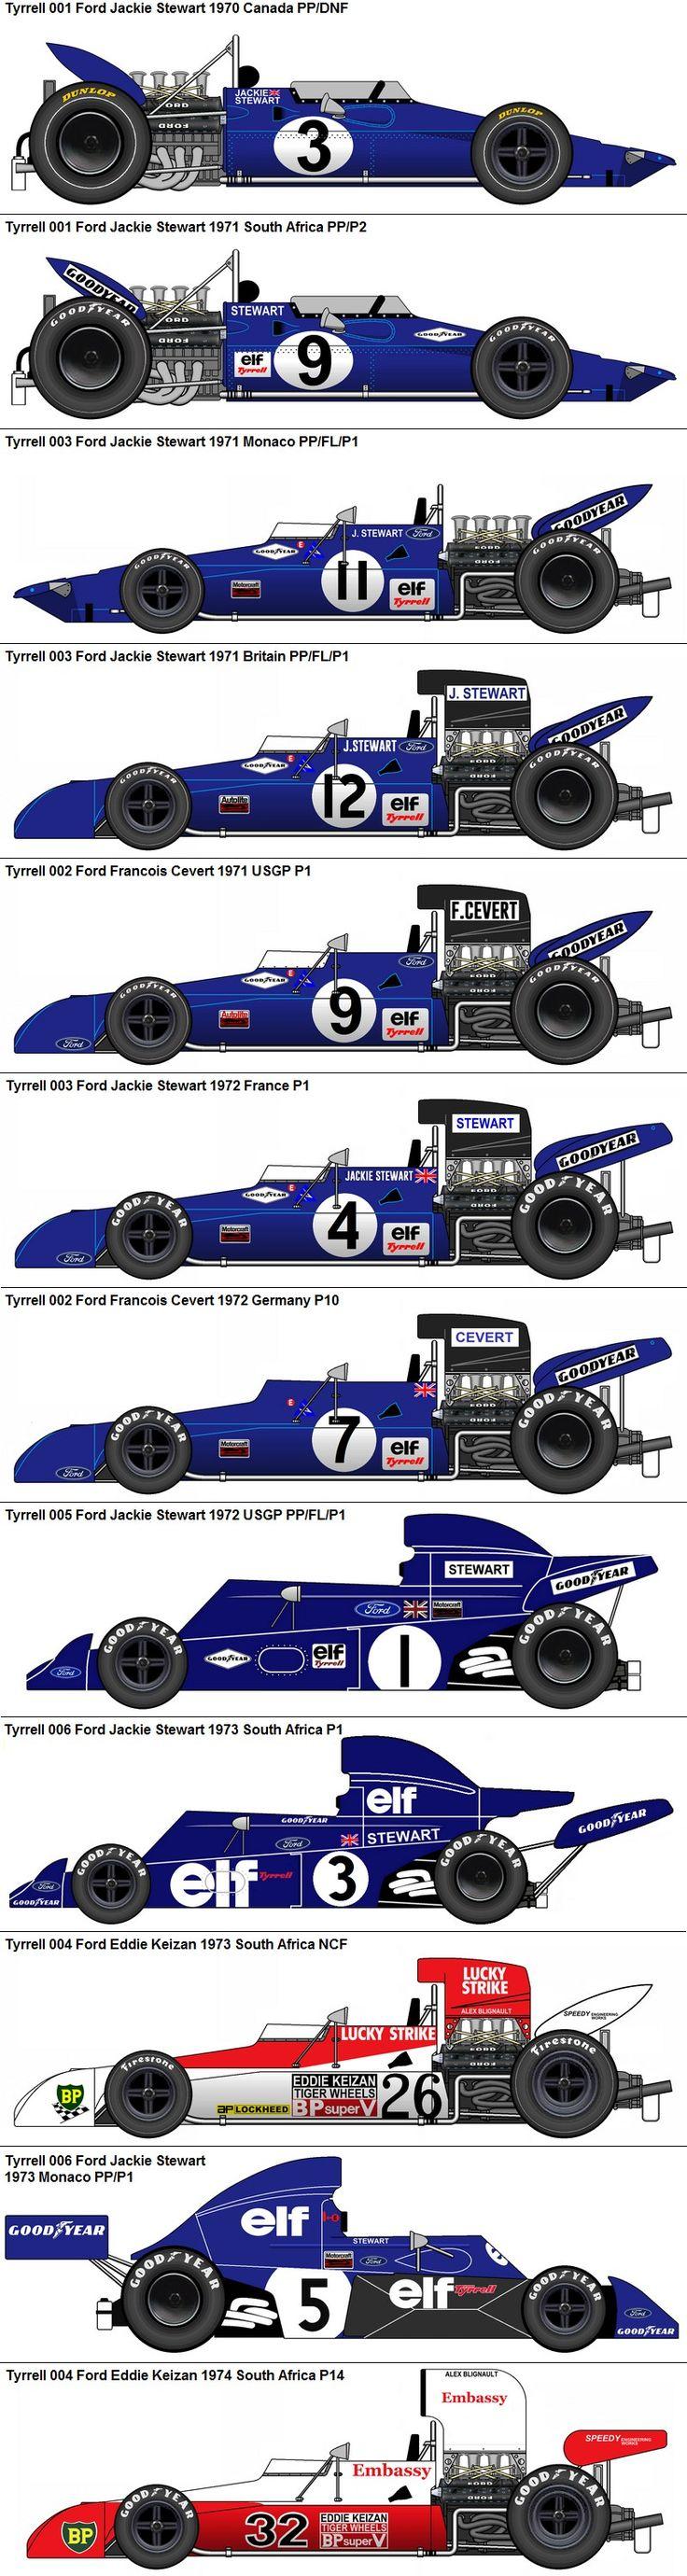 Formula One Grand Prix Tyrrell-Fords 001/002/003/004/005/006